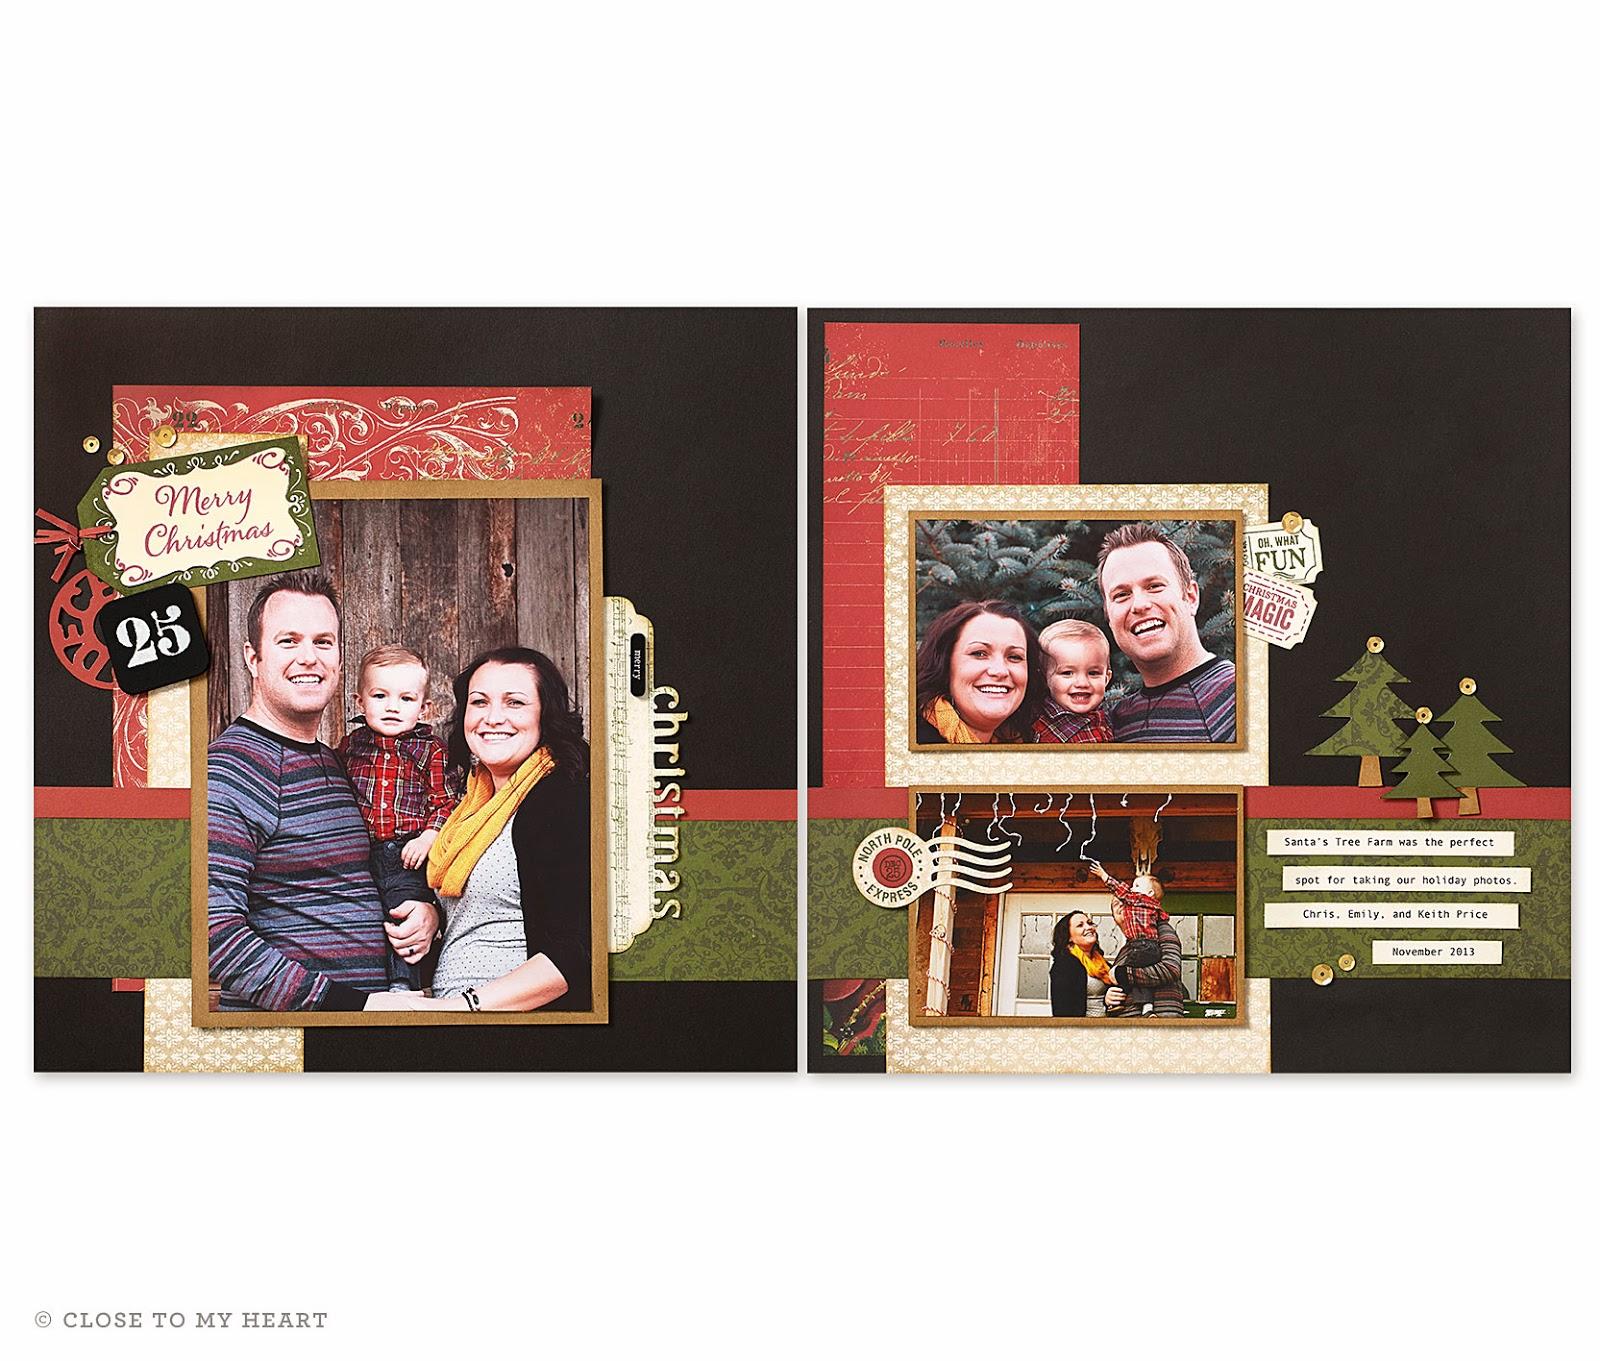 CTMH Yuletide Carol Holiday Scrapbook Layout